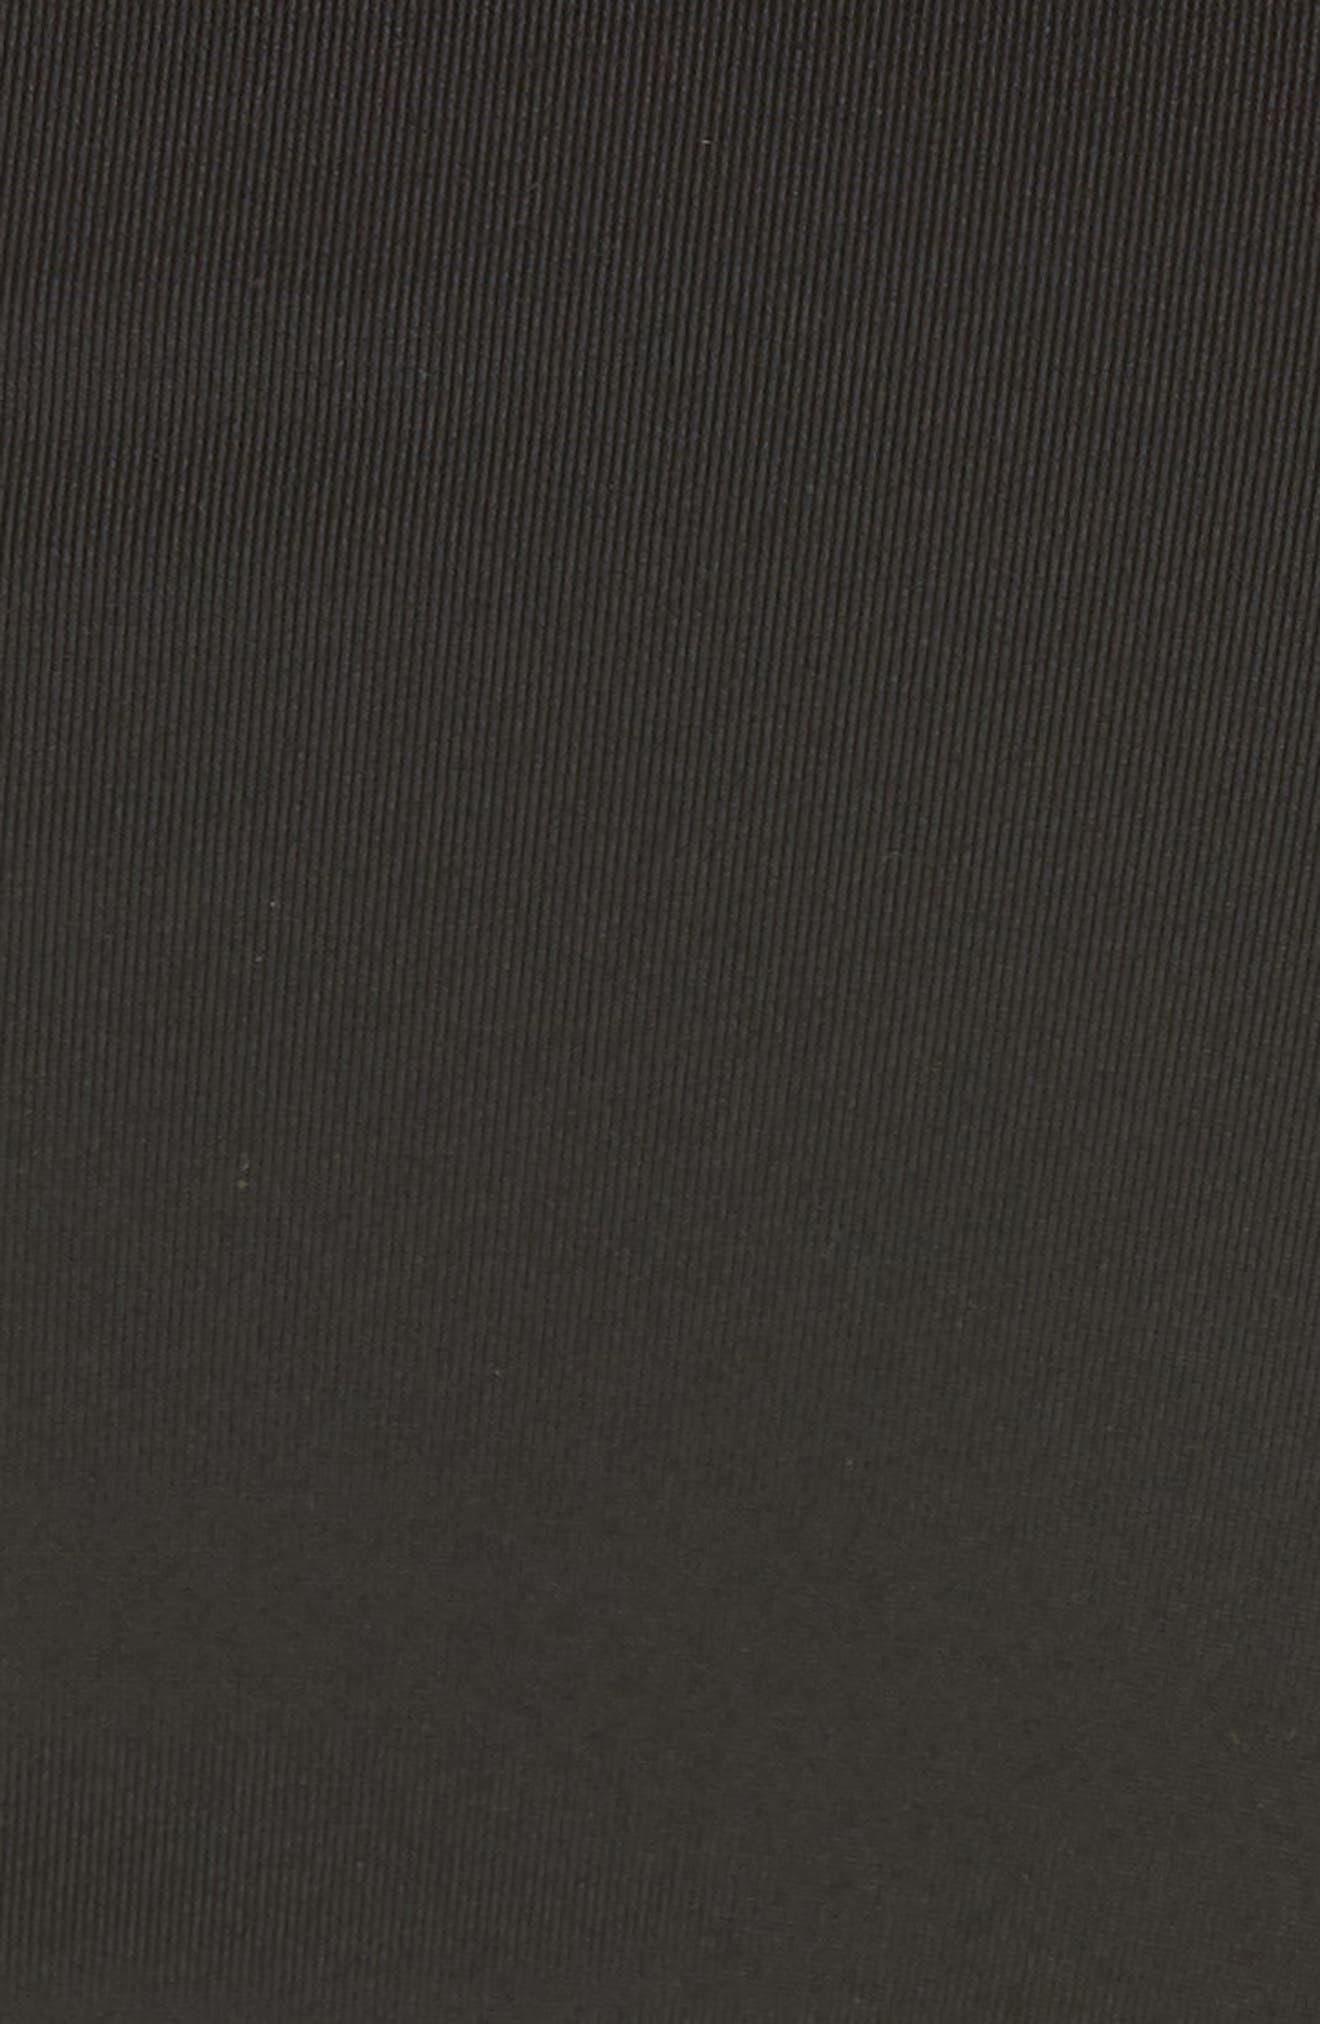 Hipster Panties,                             Alternate thumbnail 5, color,                             BLACK